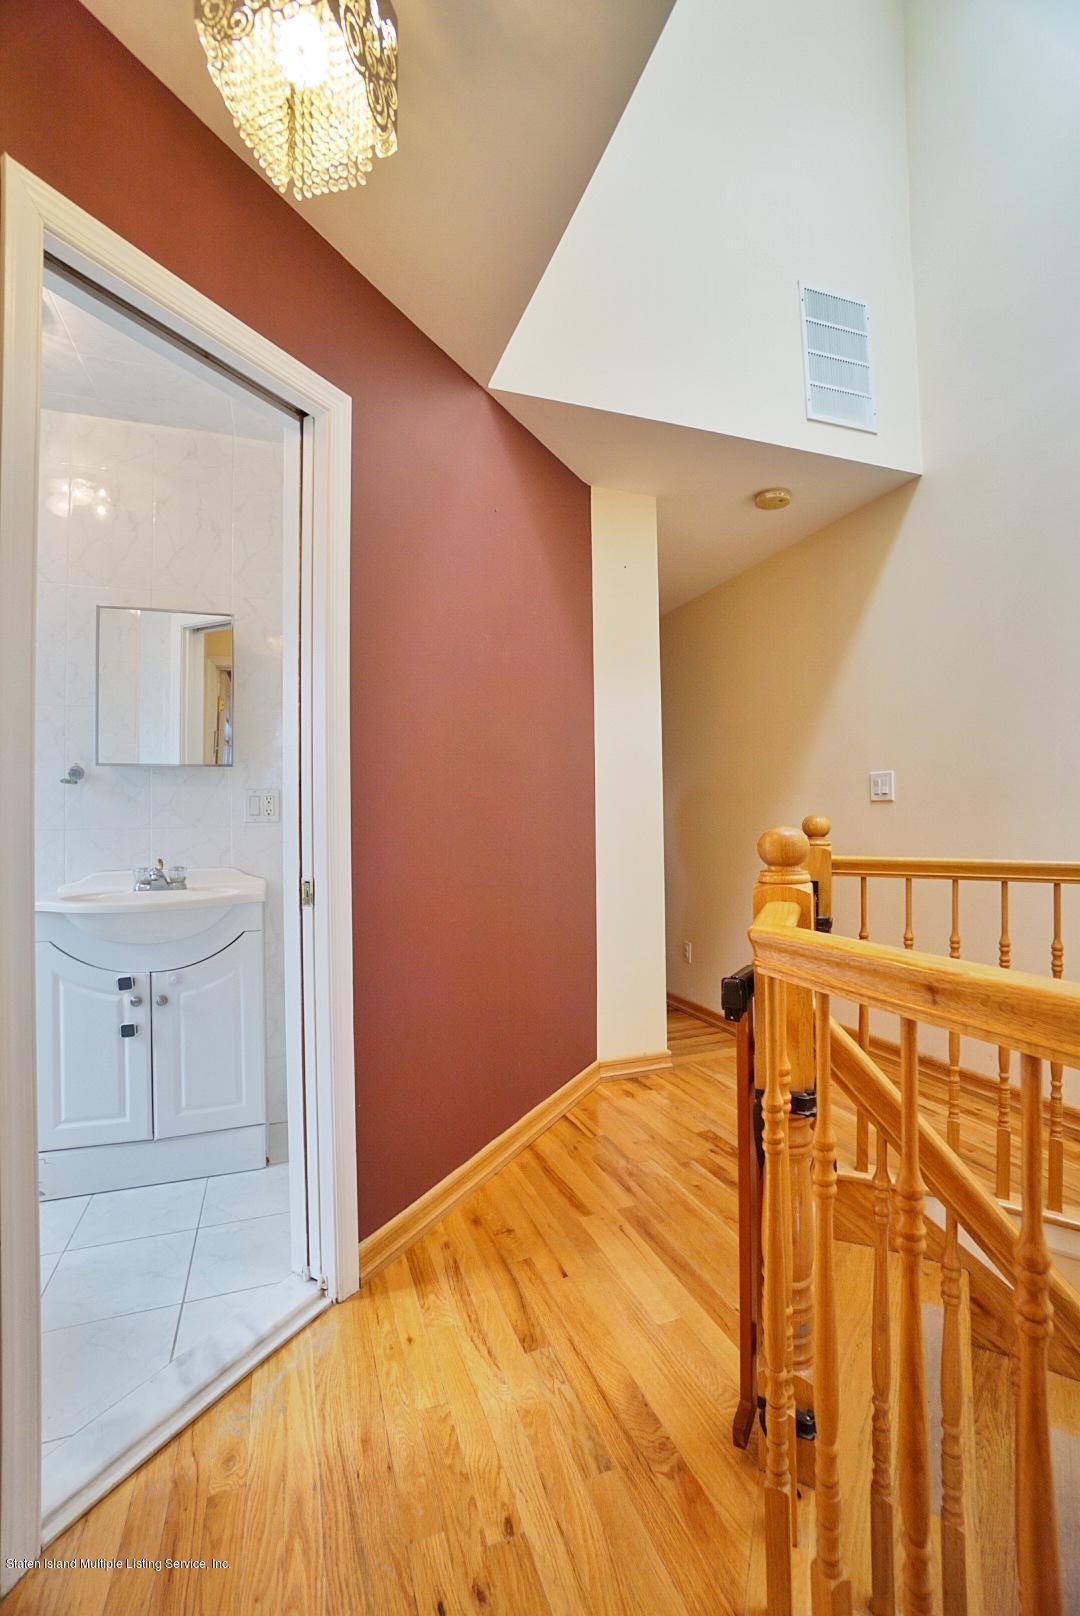 Single Family - Semi-Attached 36 Zwicky Avenue  Staten Island, NY 10306, MLS-1131911-16